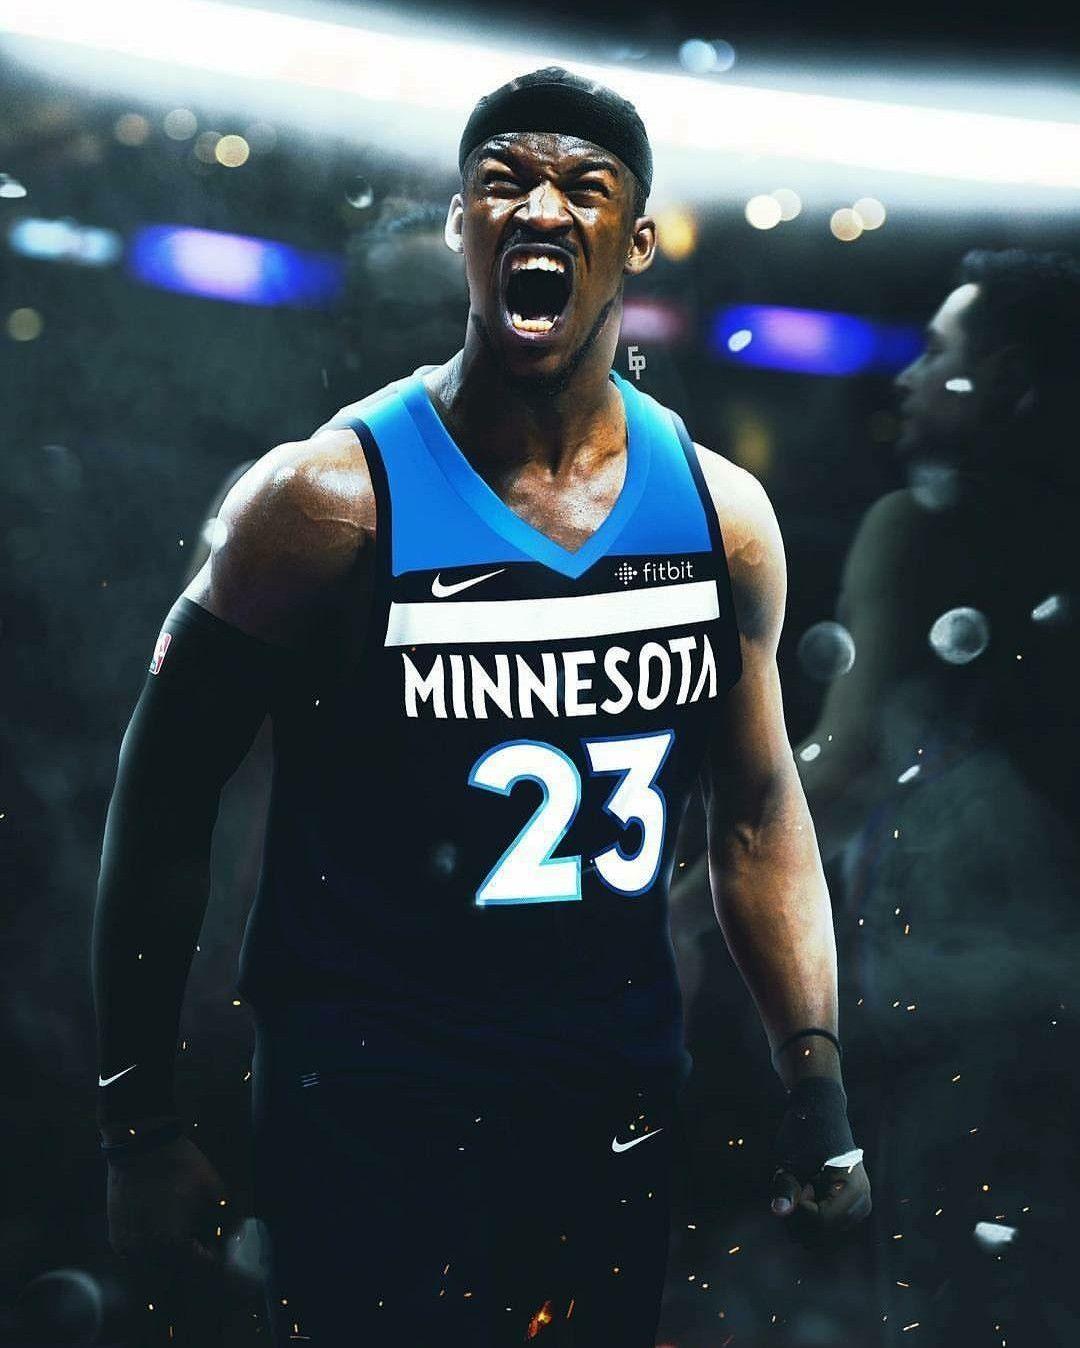 Jimmy Butler Minnesota Timberwolves Minnesota Timberwolves Basketball Minnesota Timberwolves Minnesota